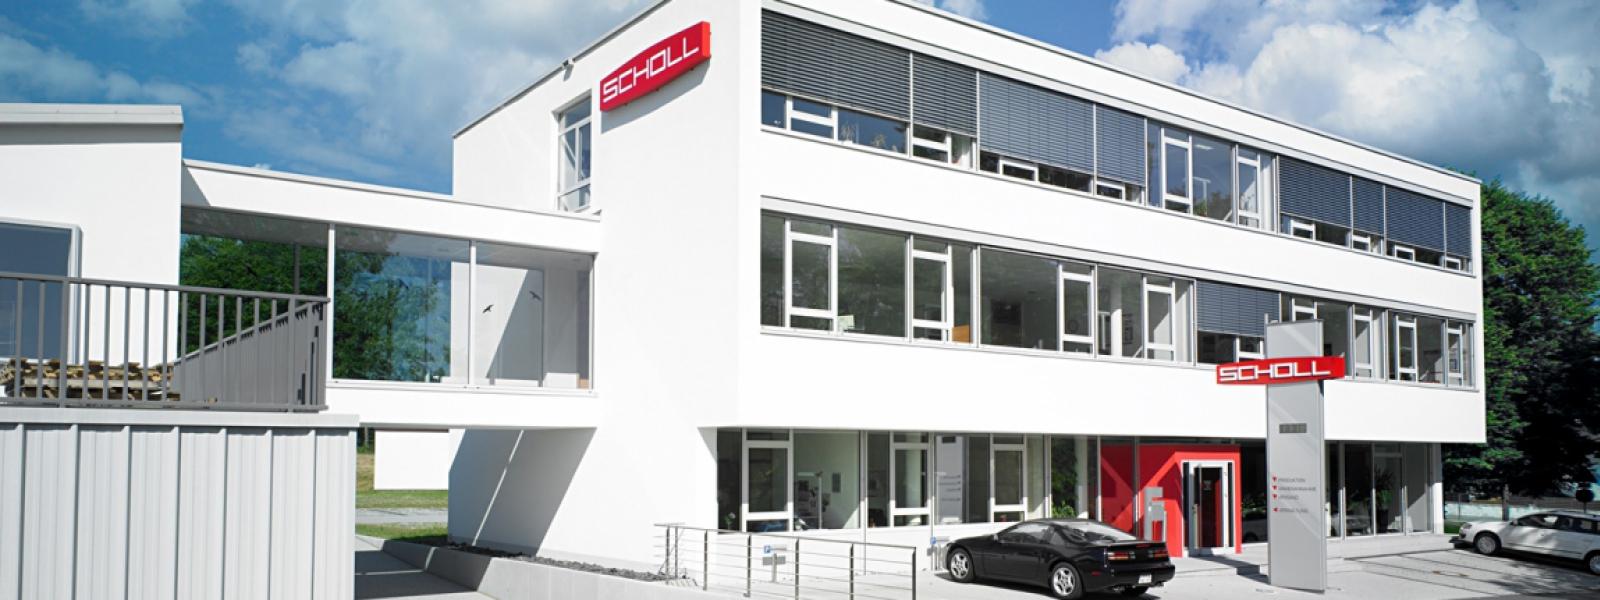 Bürogebäude Scholl Gastro